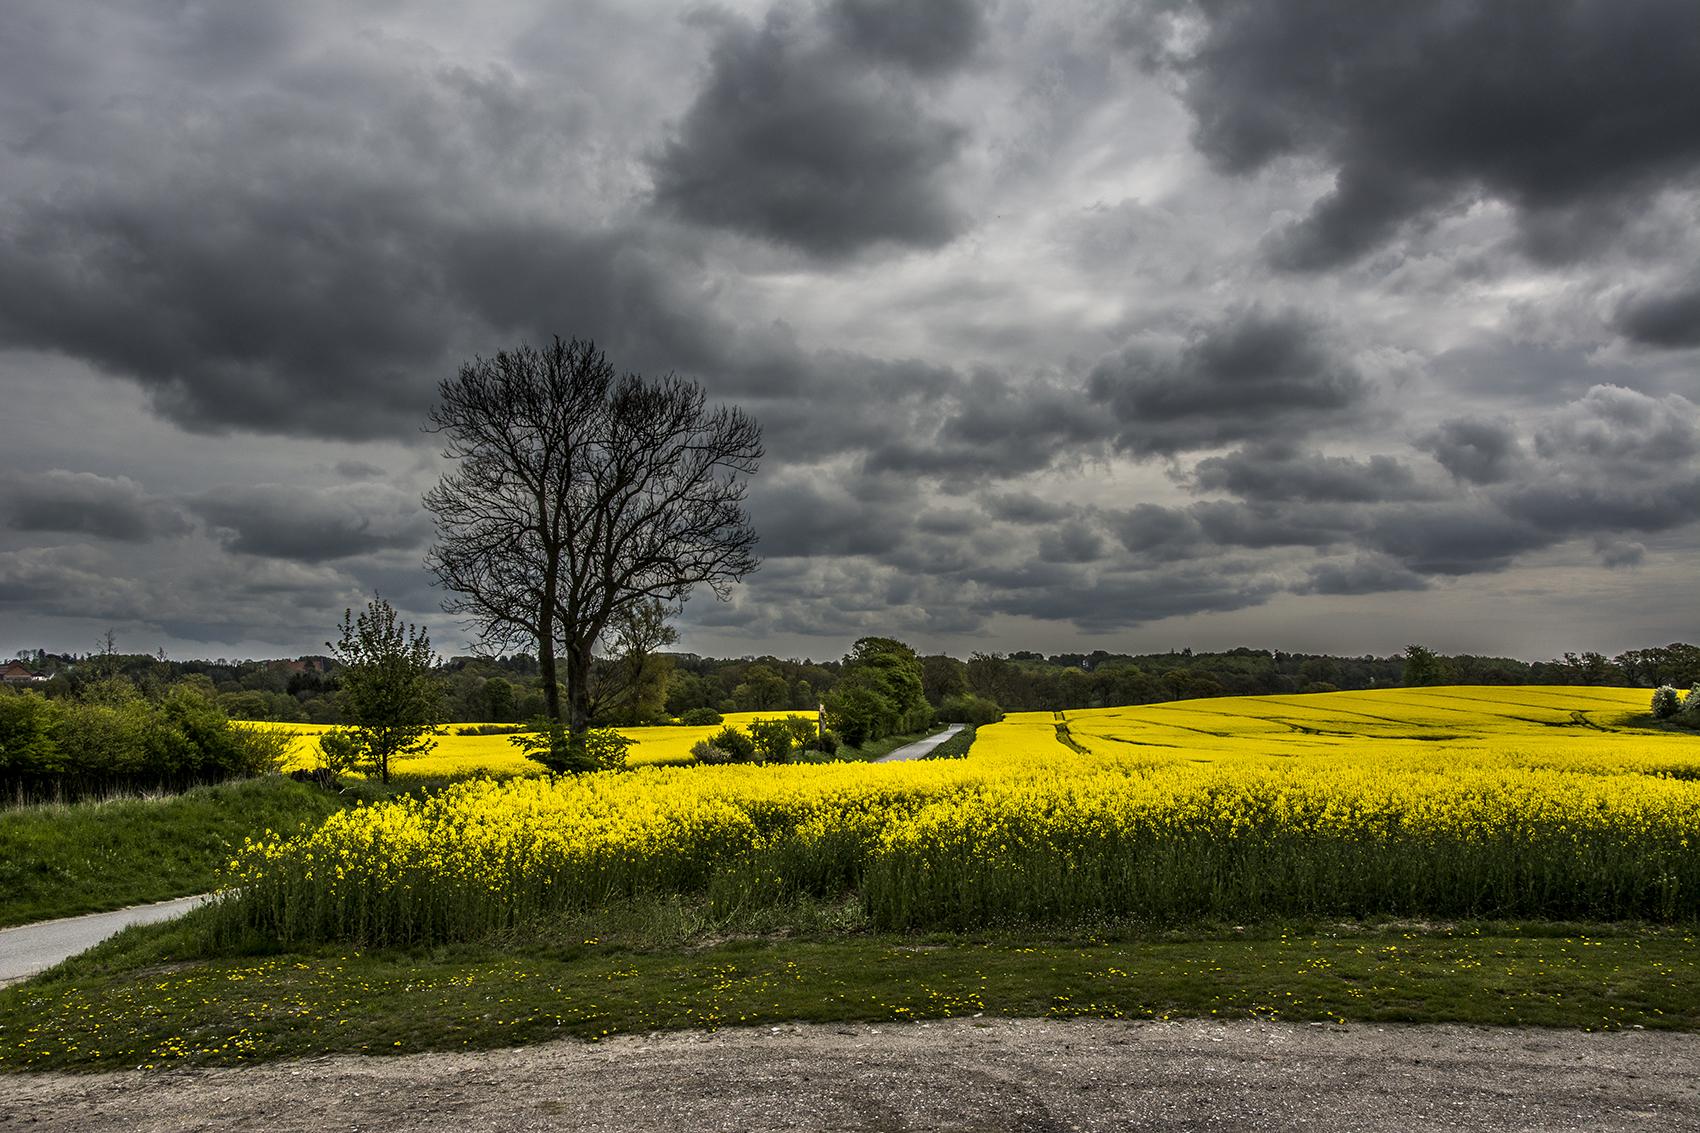 Yellow fields and gray skies - Fc Nikon